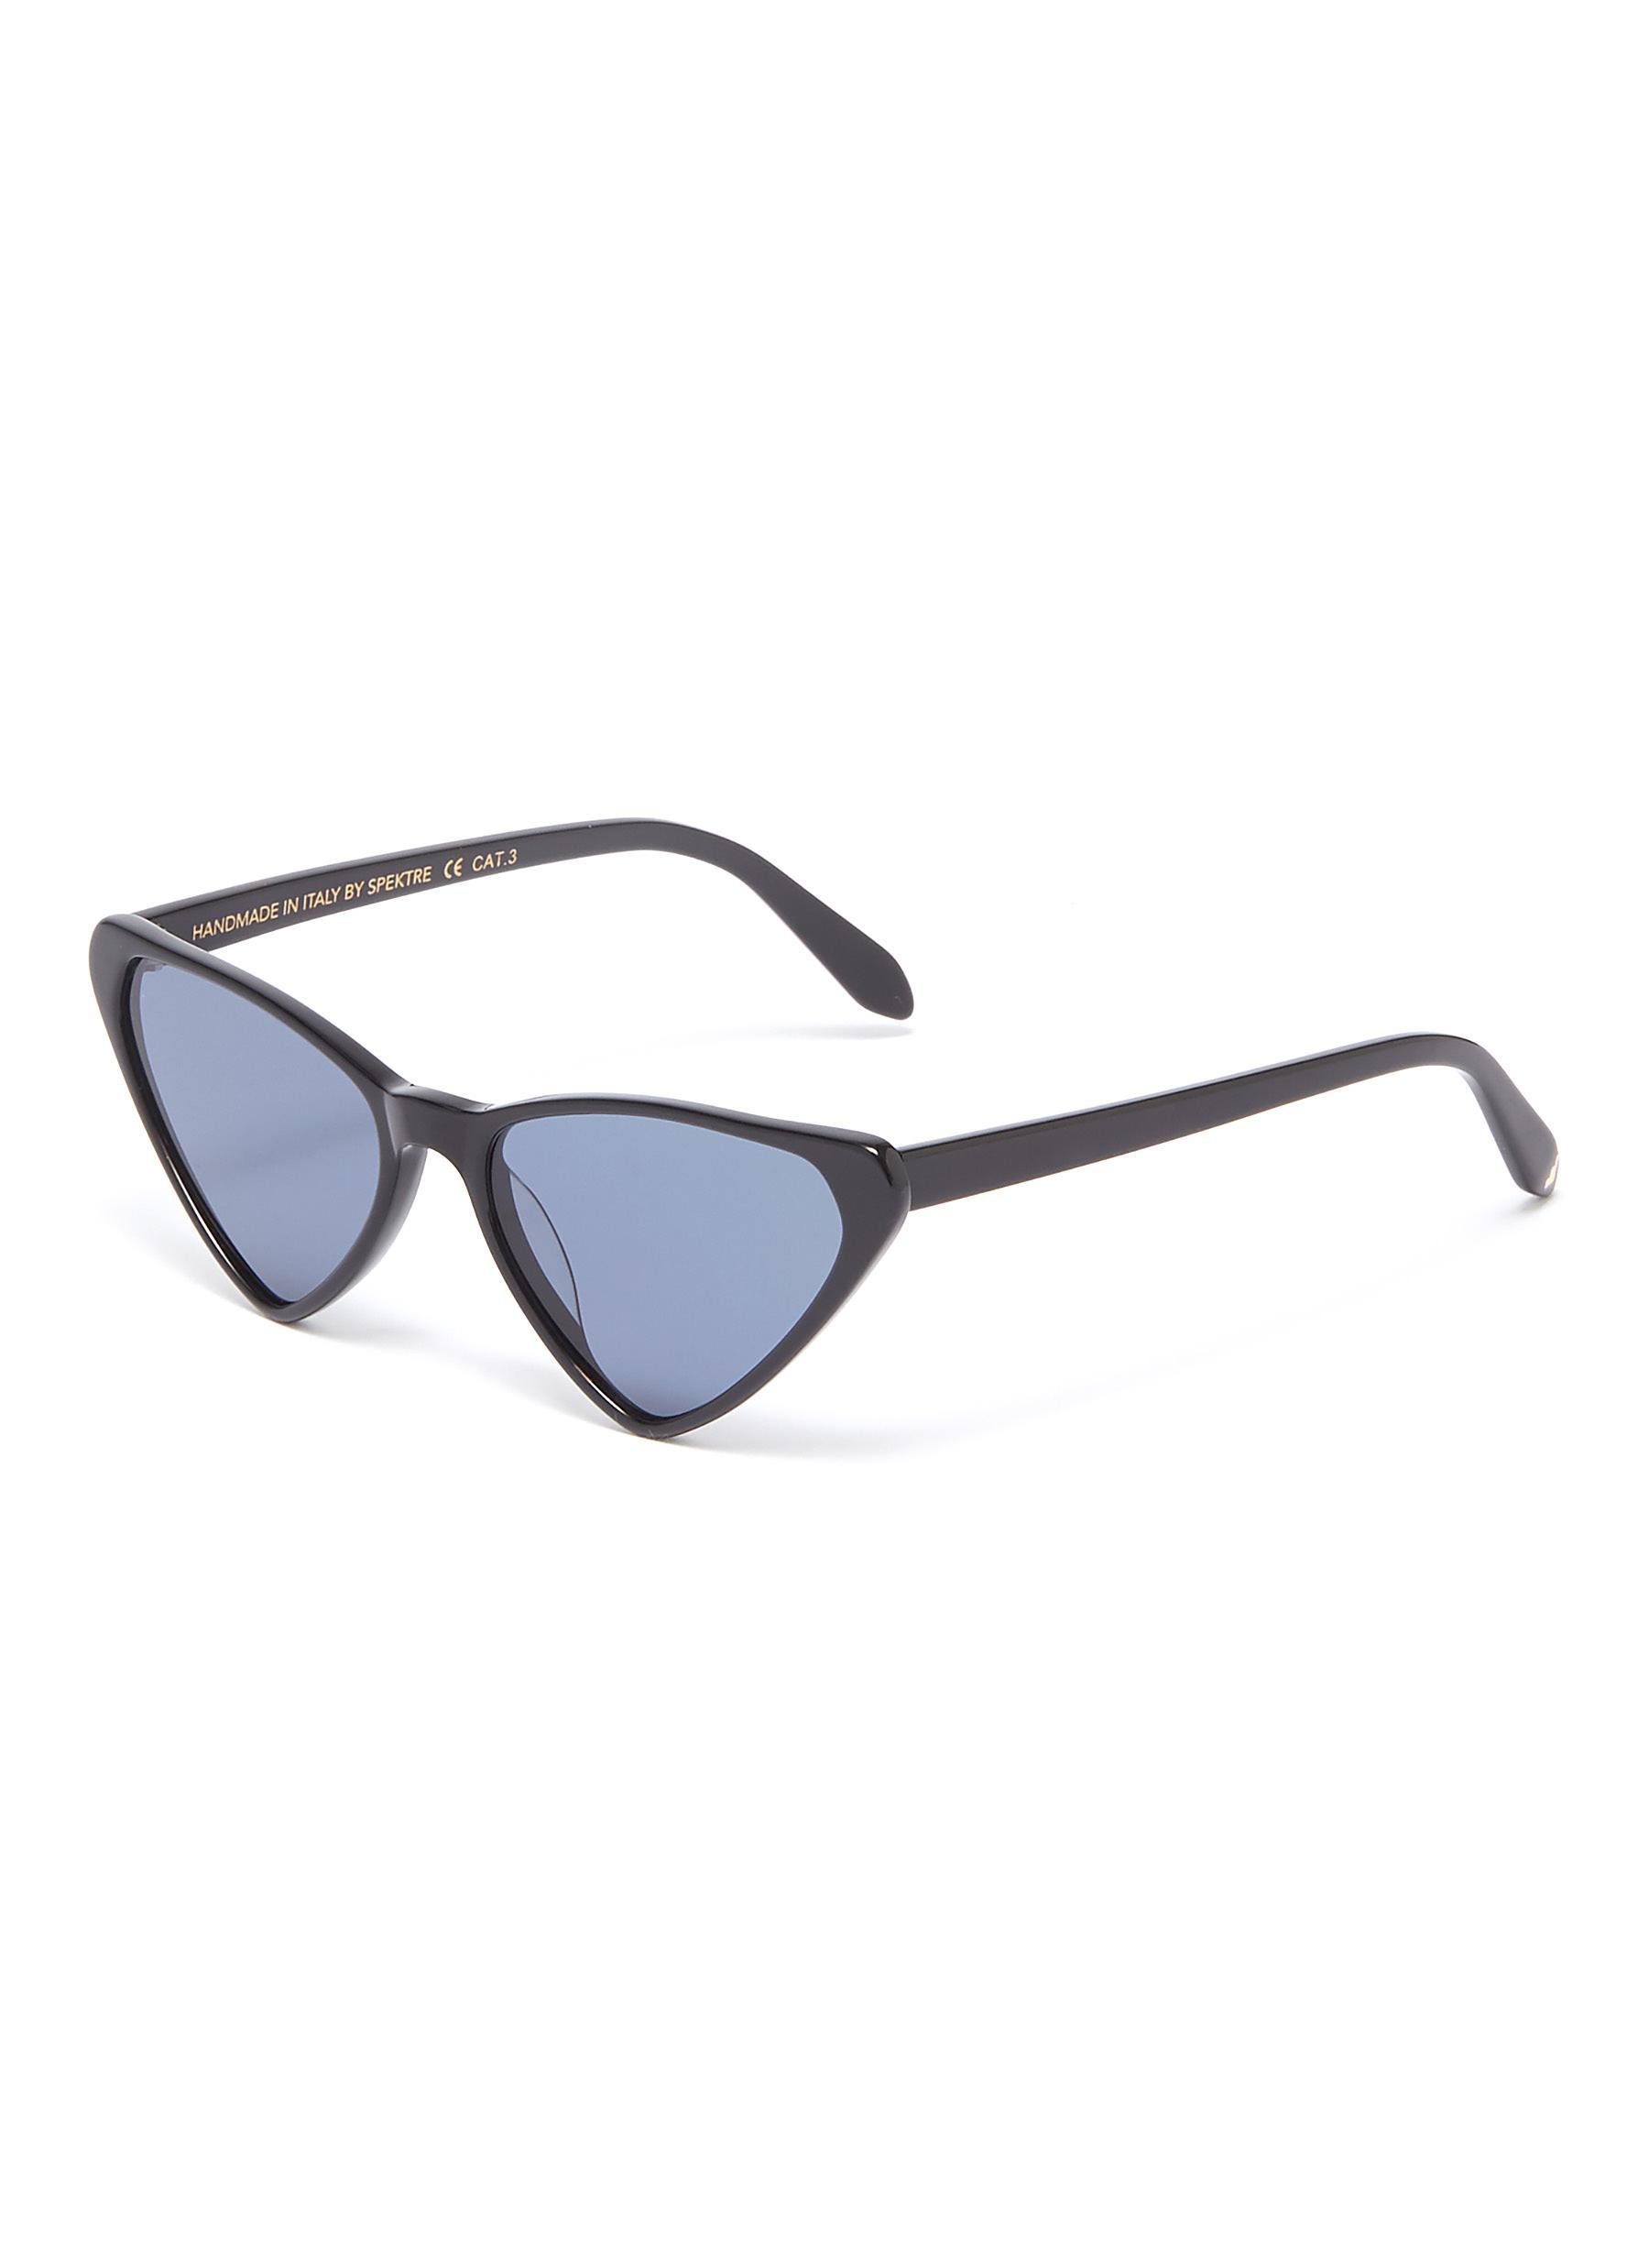 ed3177c4d8bef9 Main View - Click To Enlarge - Spektre -  Frida  acetate triangular frame  sunglasses